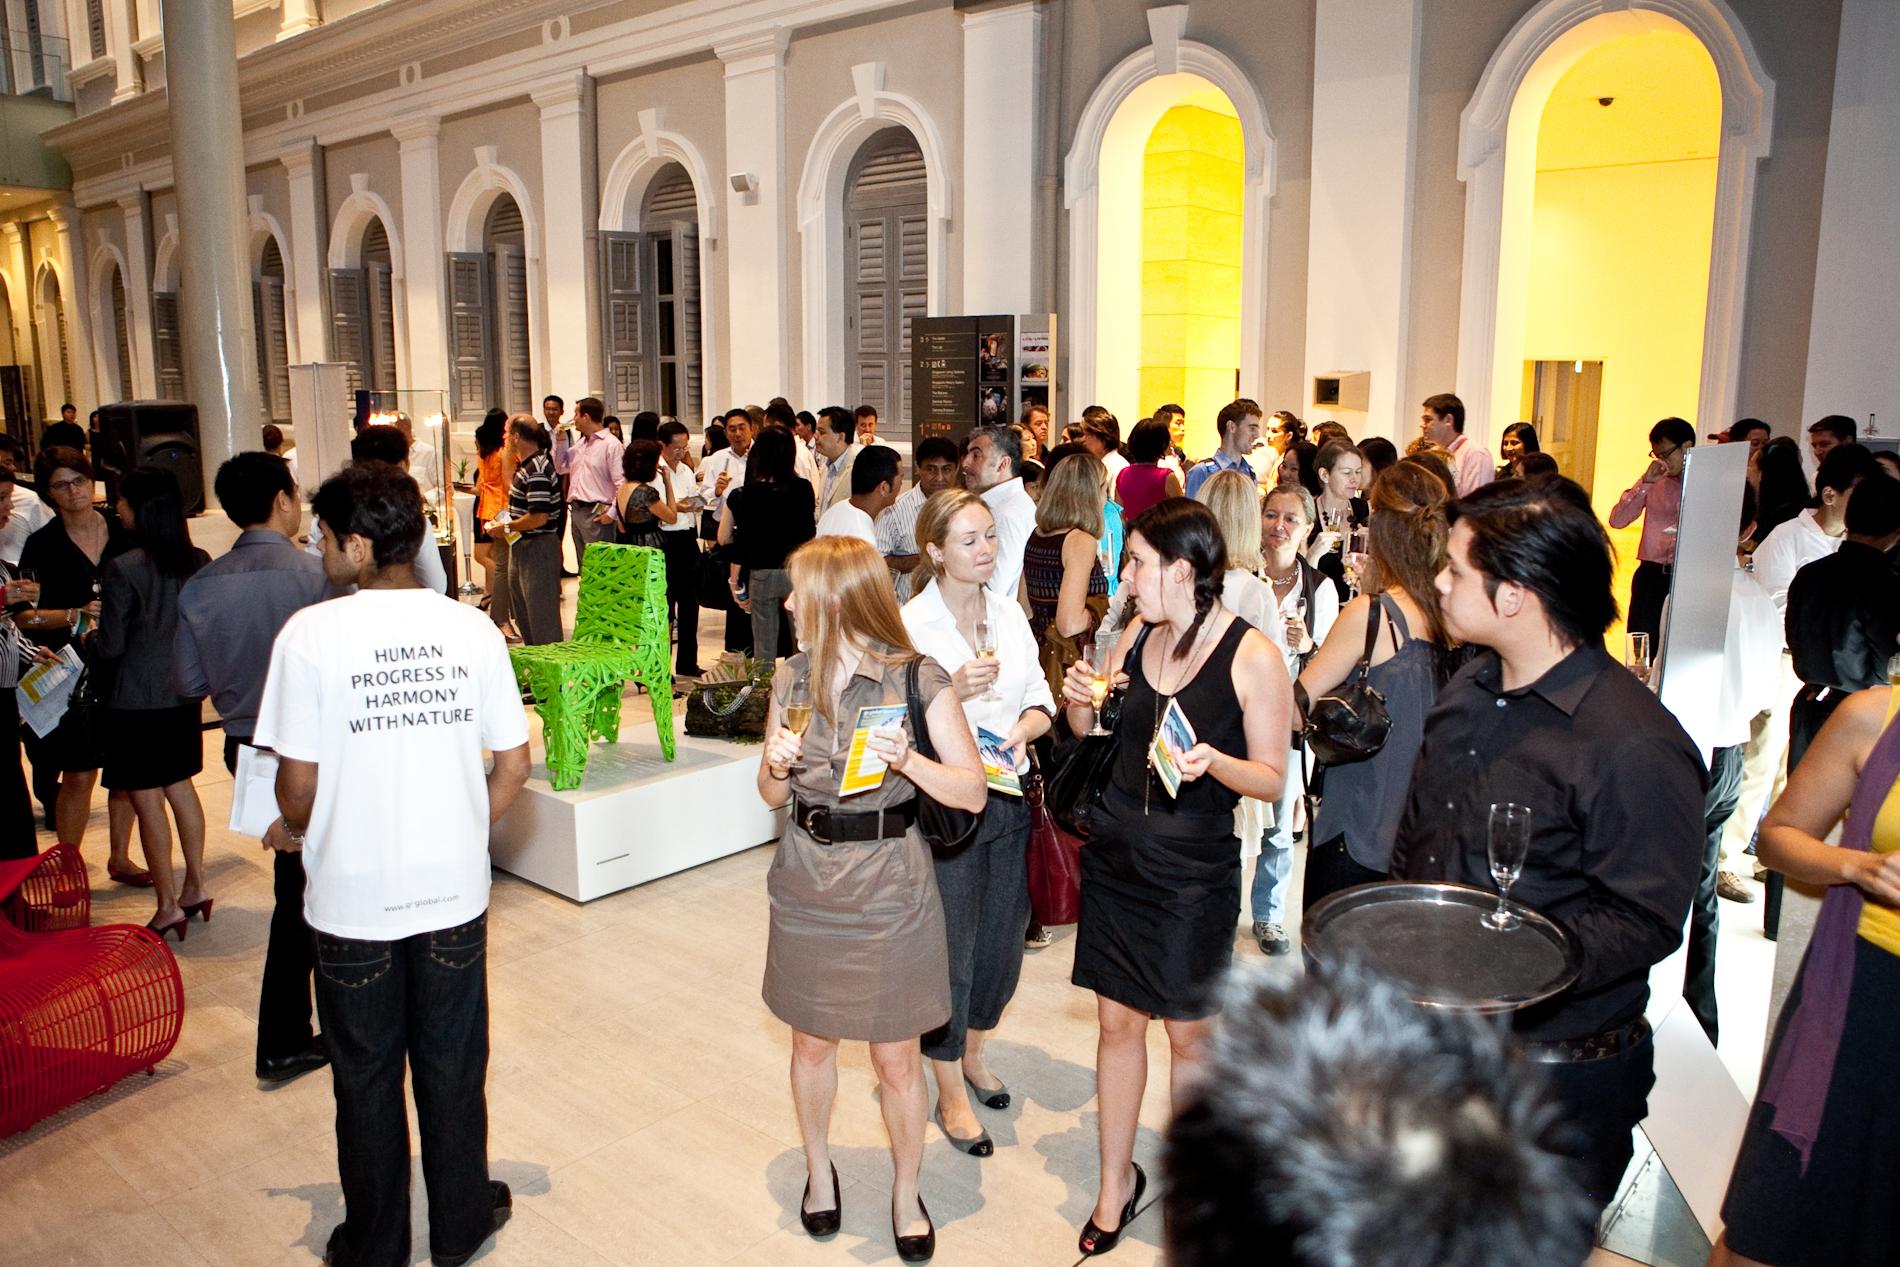 qi-global-2009-sustaible-design-singapore-098.jpg